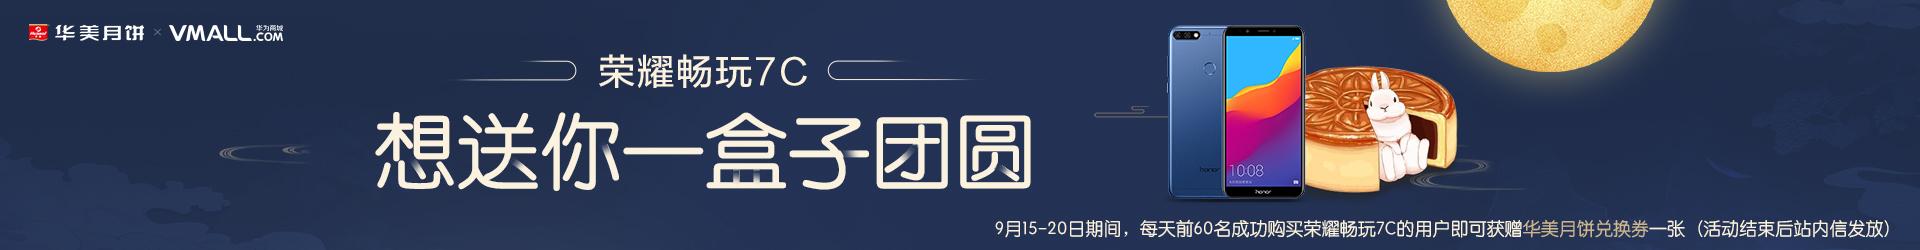 7c中秋广告图(1920-250).jpg